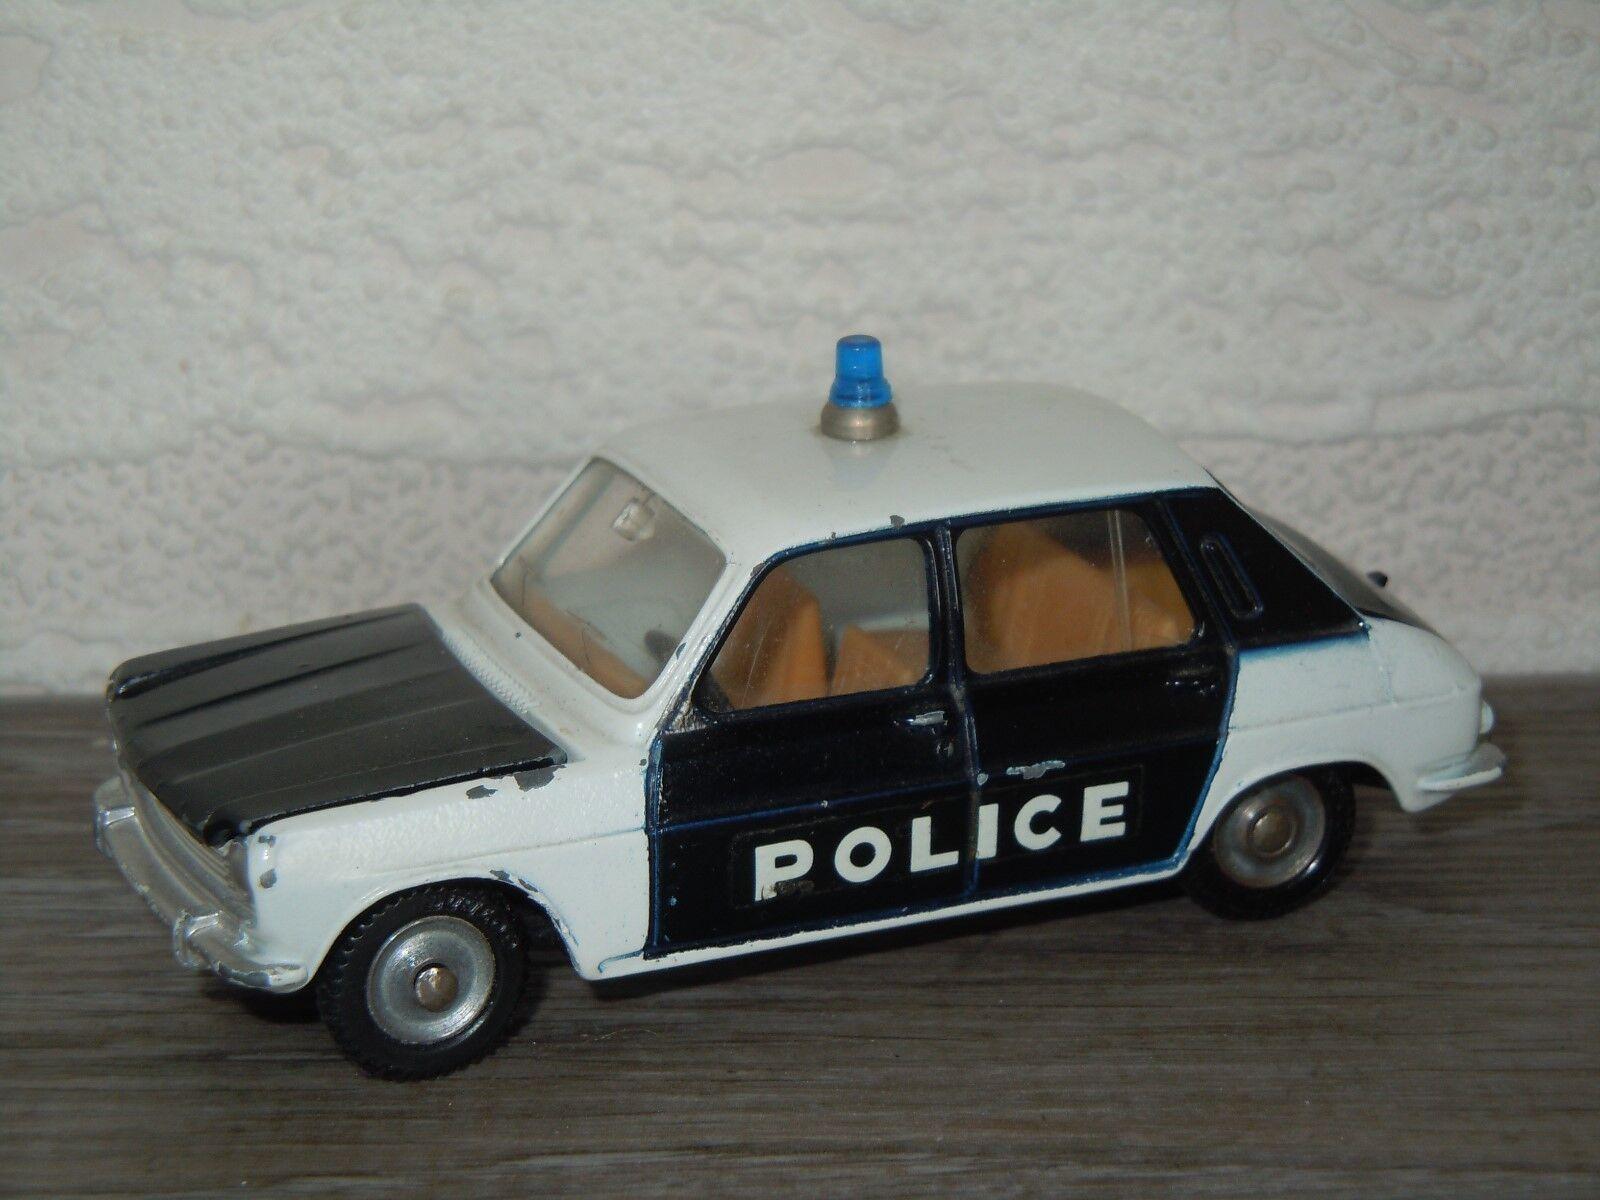 Simca 1100 Police - Dinky Toys 1407 France 1 43 32892